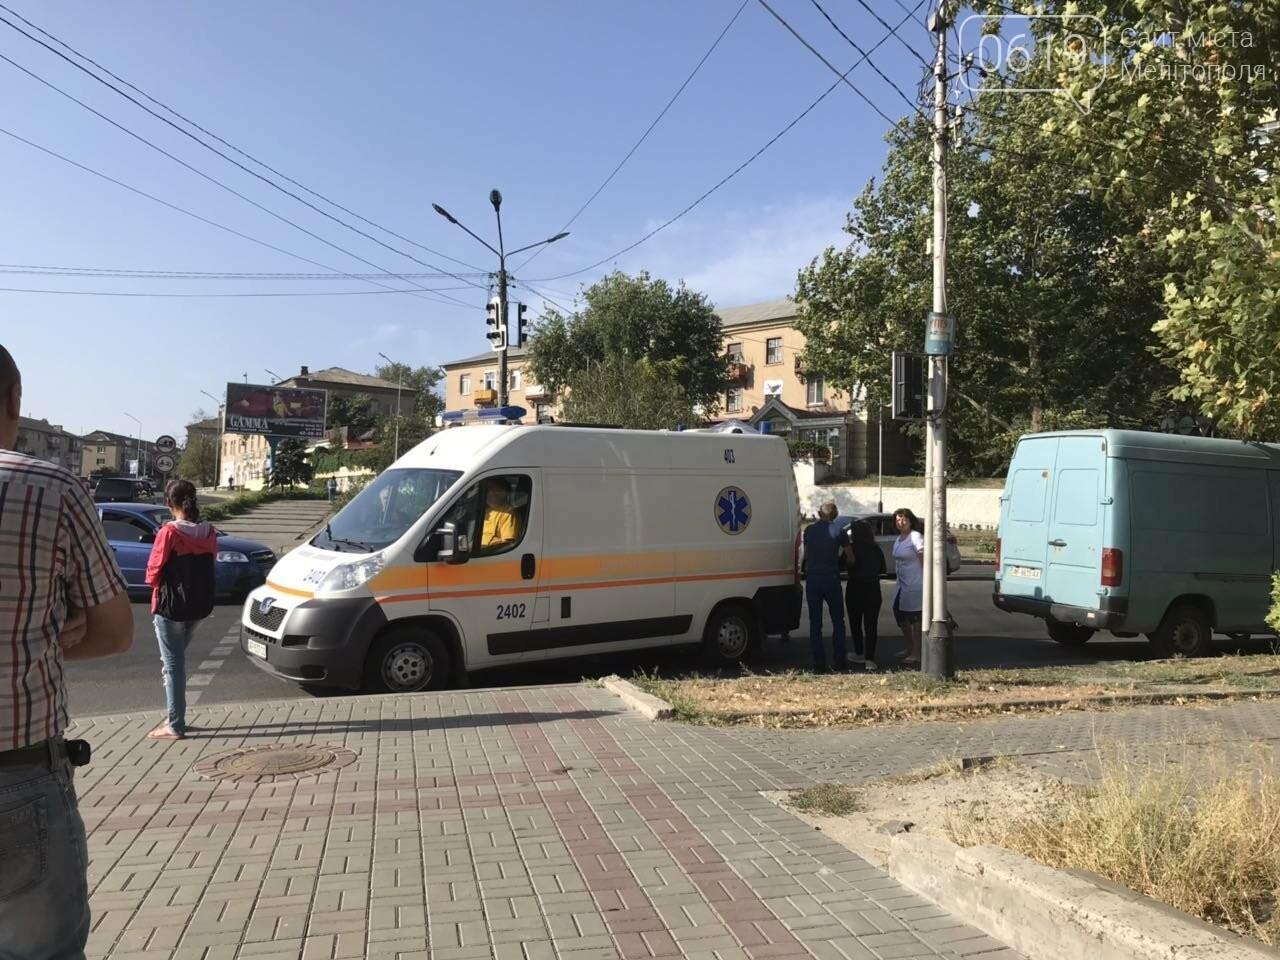 В Мелитополе на пешеходном переходе сбили девушку, - ФОТО, фото-1, Фото сайта 0619